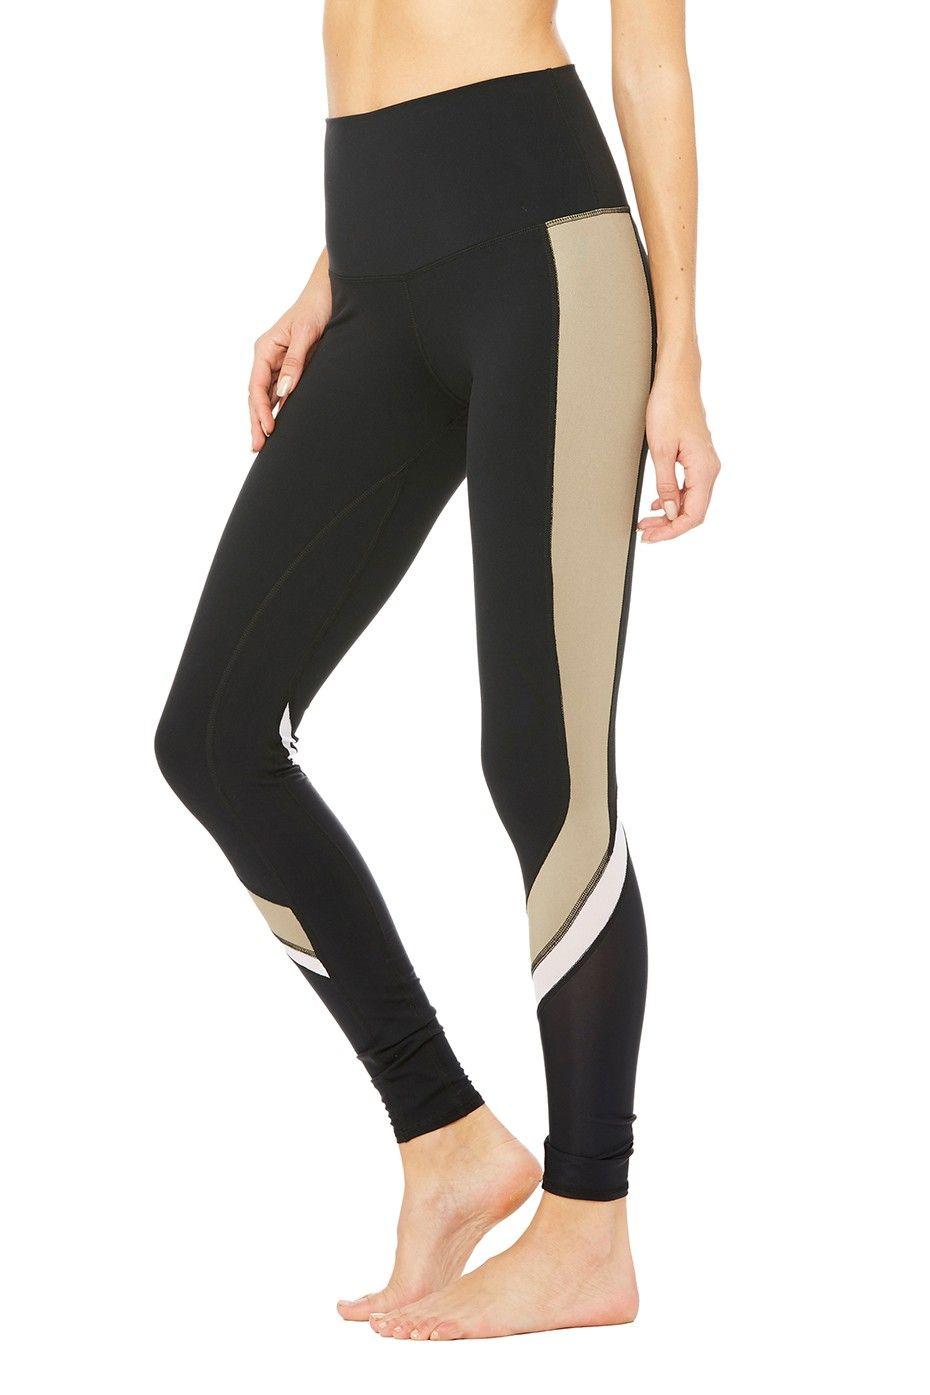 652ce7407a Elevate Legging | FIT | Yoga leggings, Women's leggings, Yoga